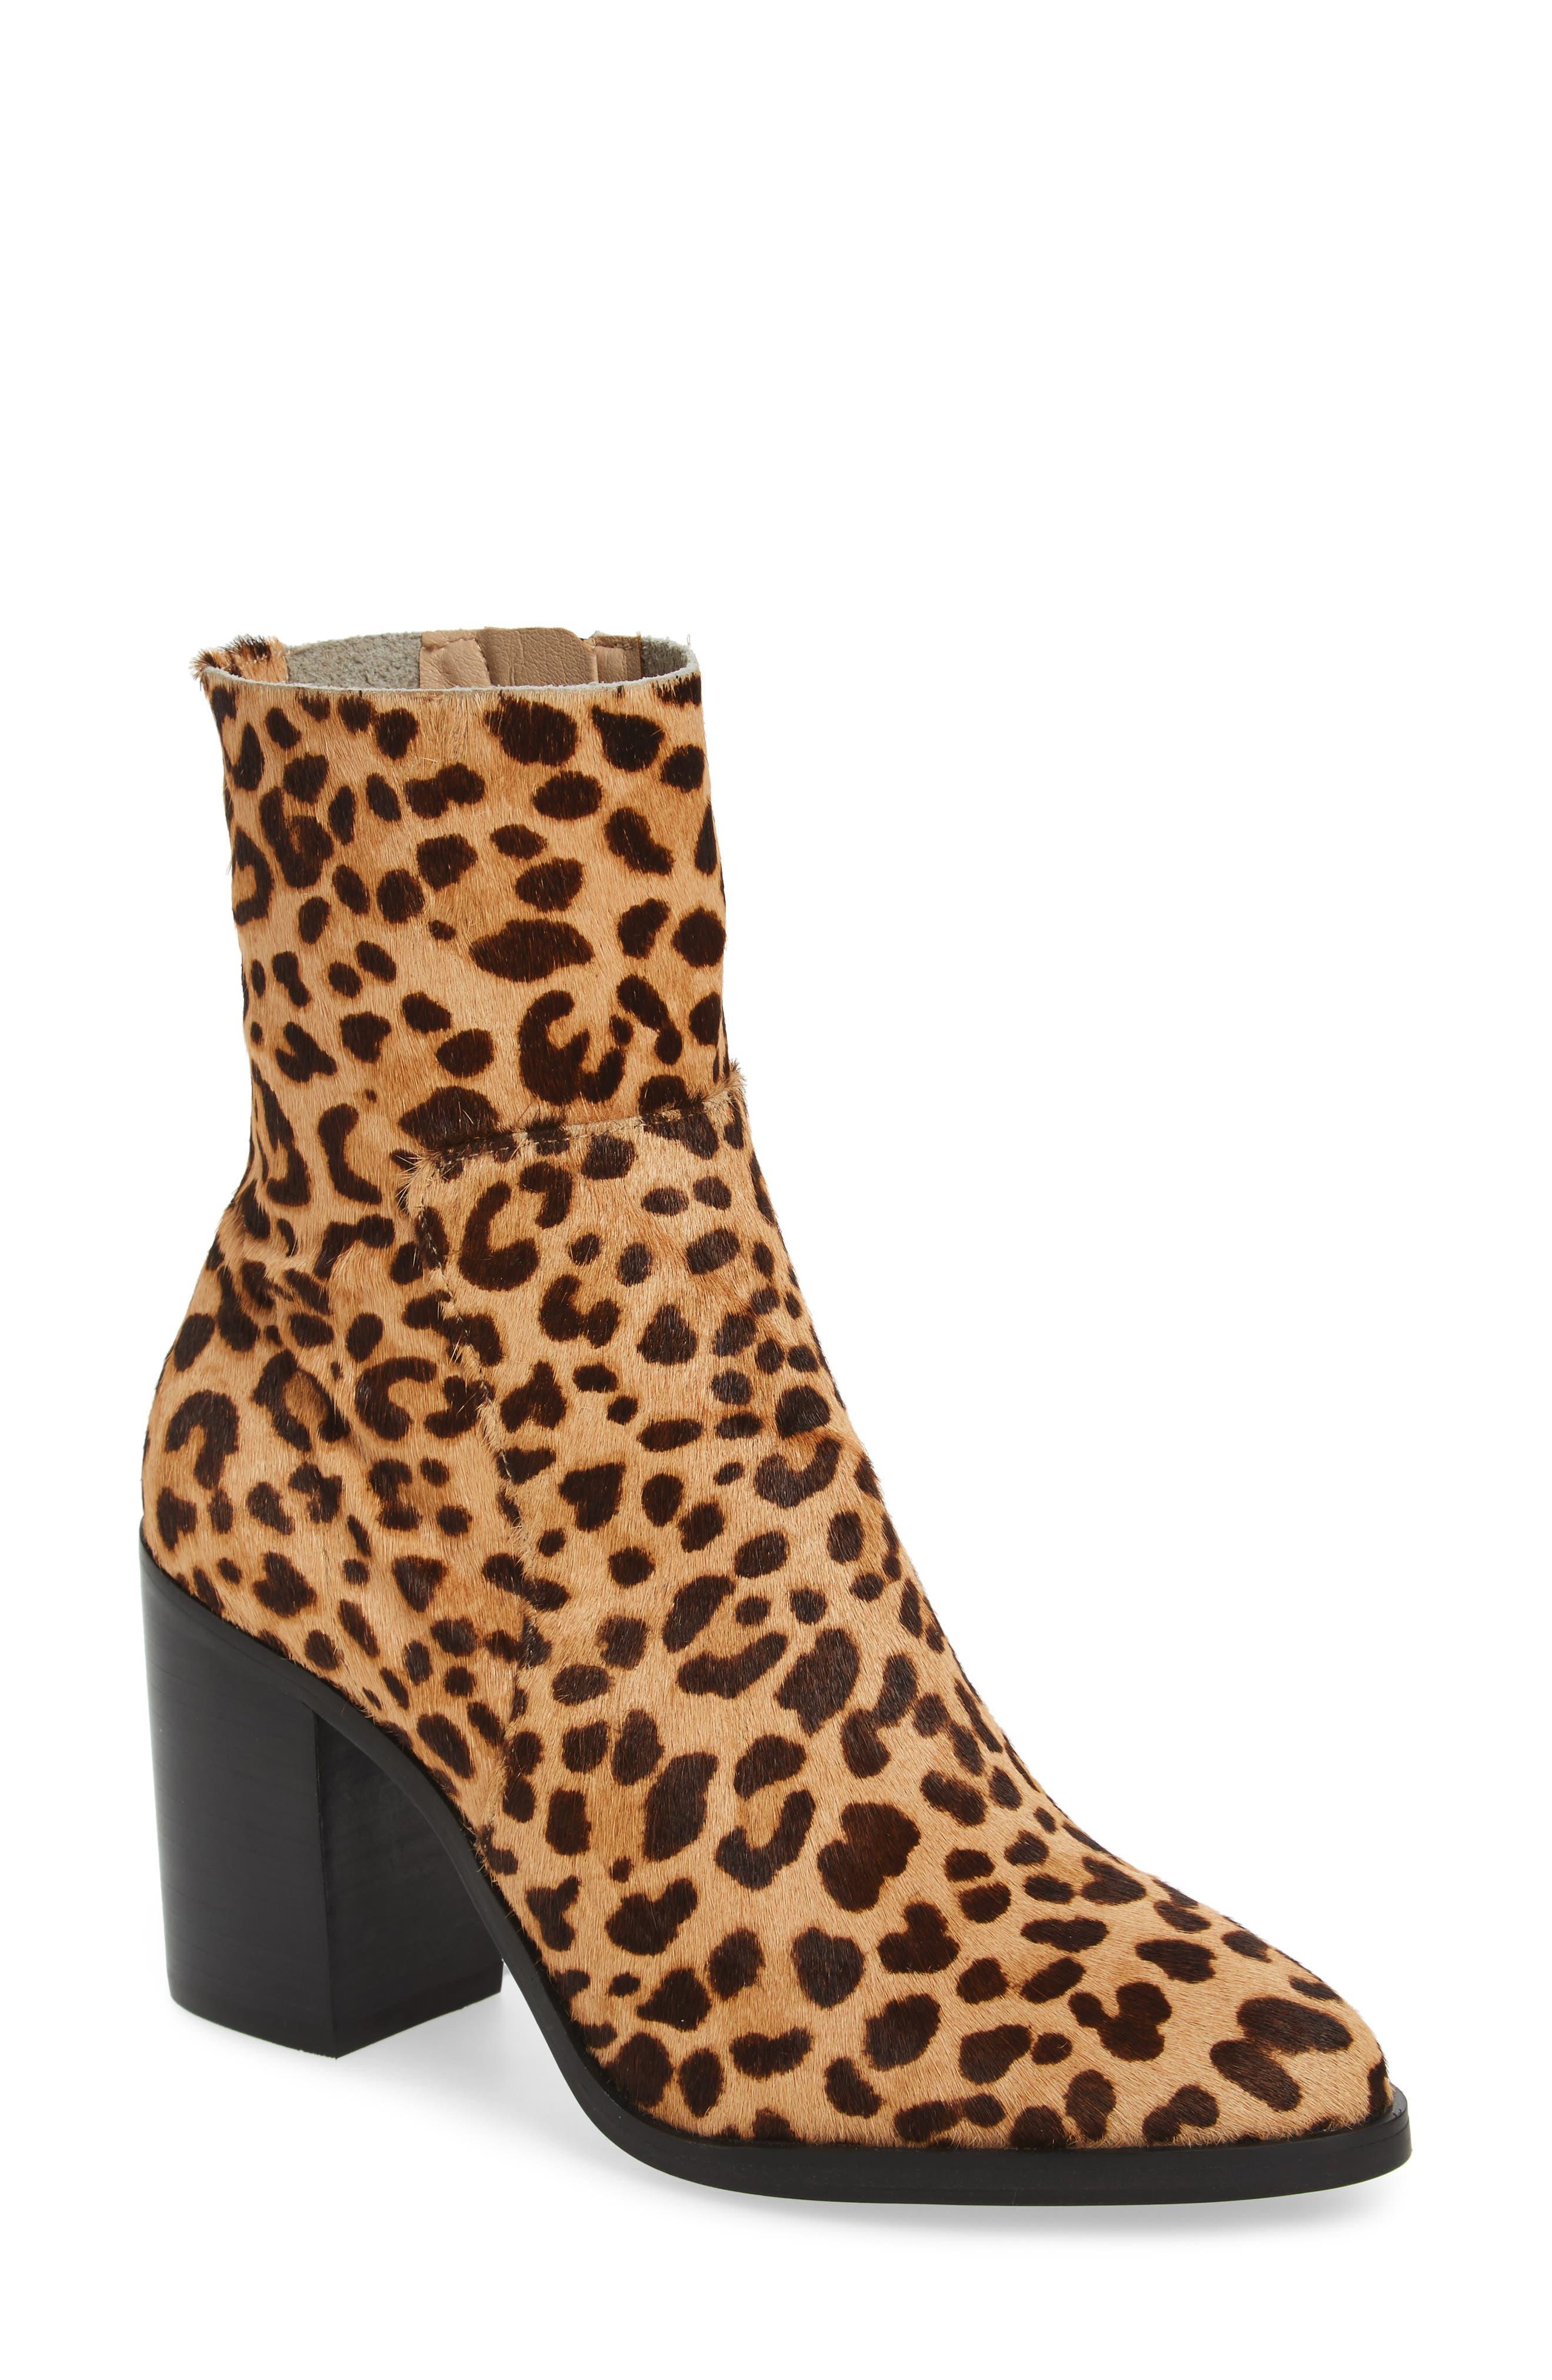 Rewind-L Genuine Calf Hair Bootie,                         Main,                         color, Leopard